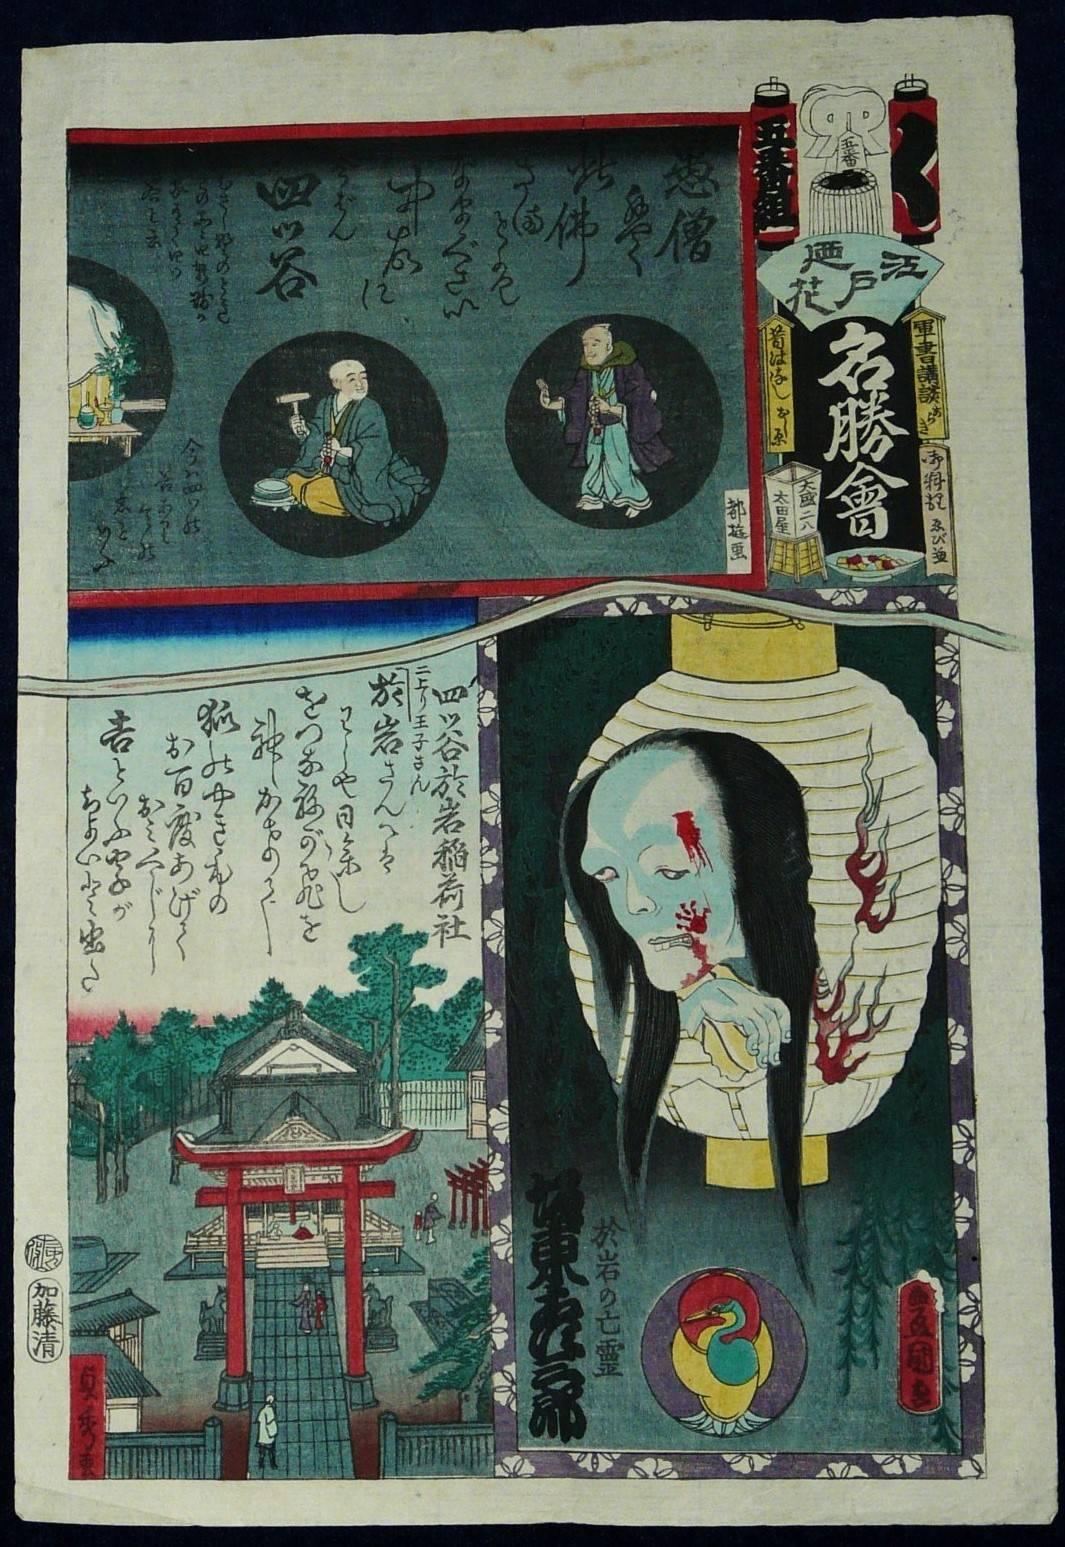 UTAGAWA KUNISADA: #P3654 GHOST OF OIWA IN YOTSUYA DATED 1863